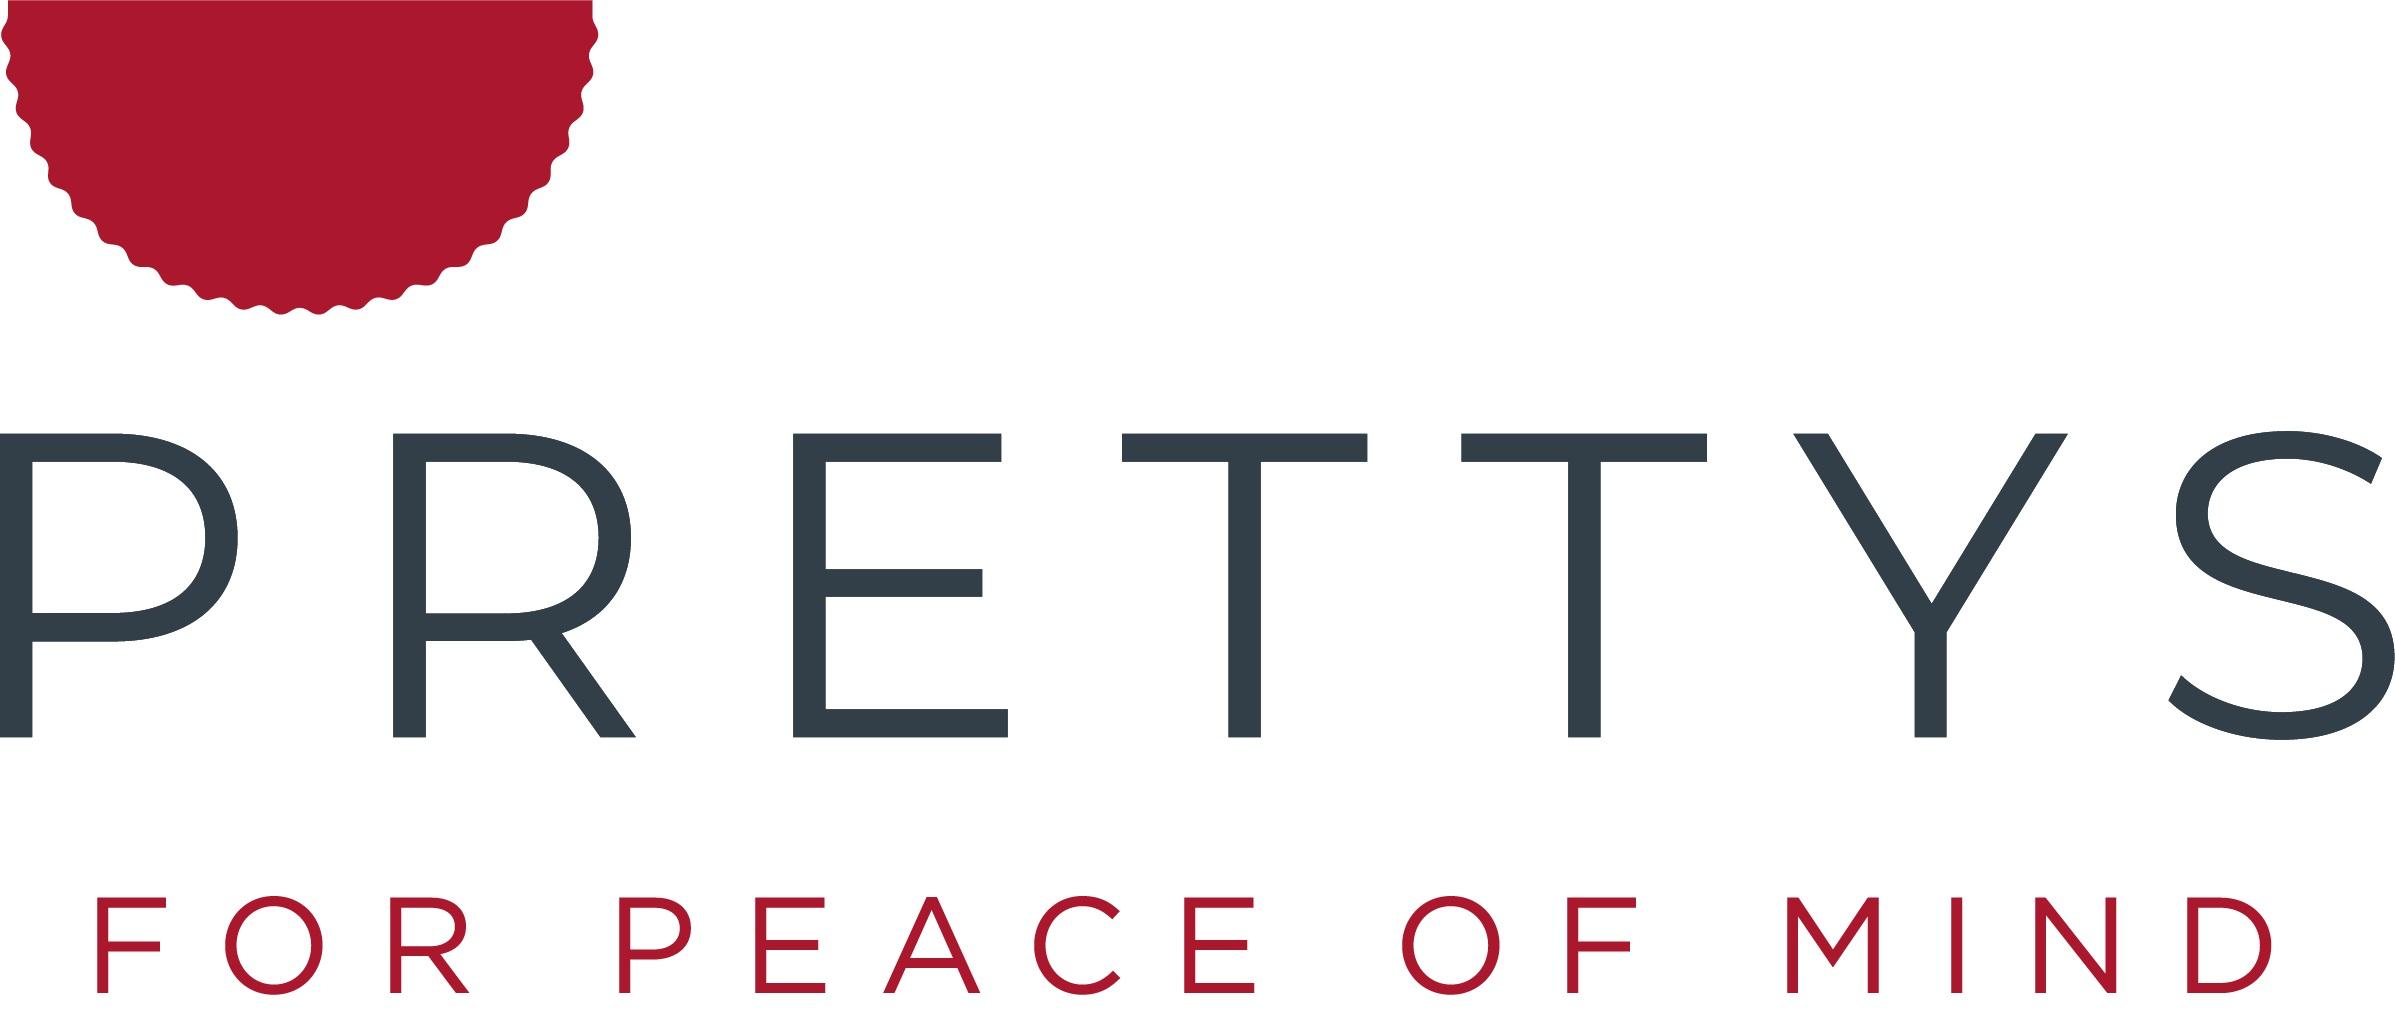 Prettys Logo (new)